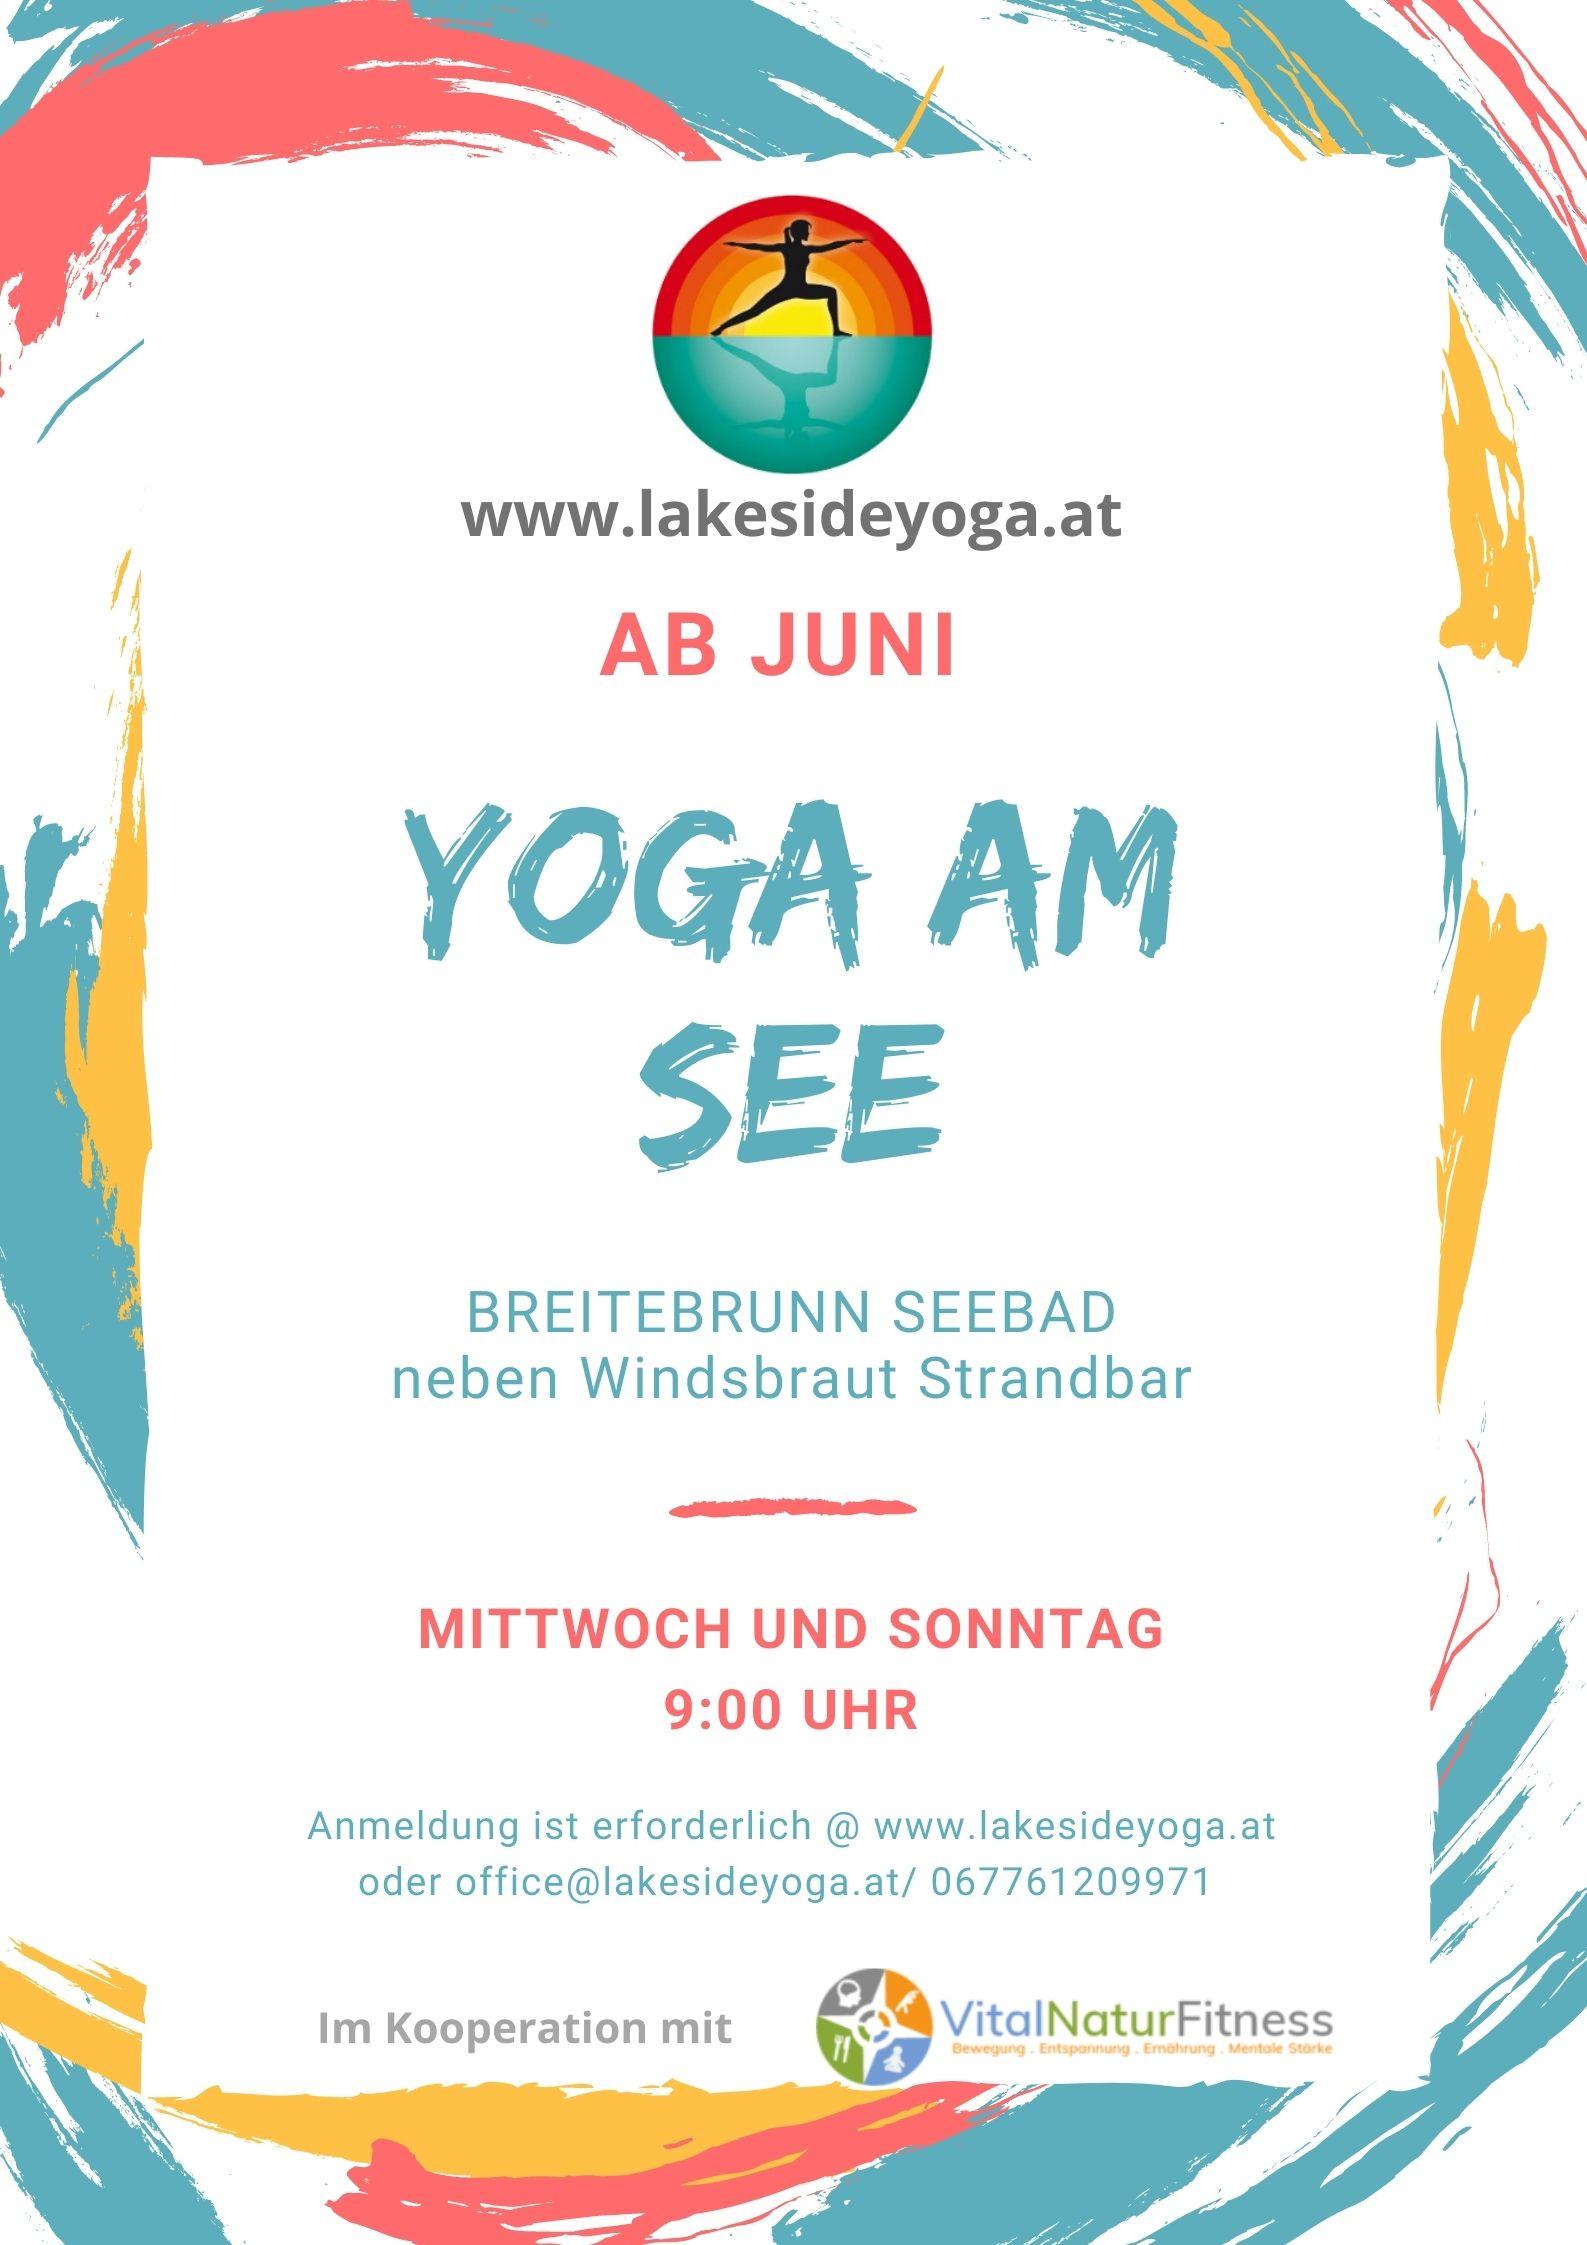 Yoga am See – Seebad Breitenbrunn am See